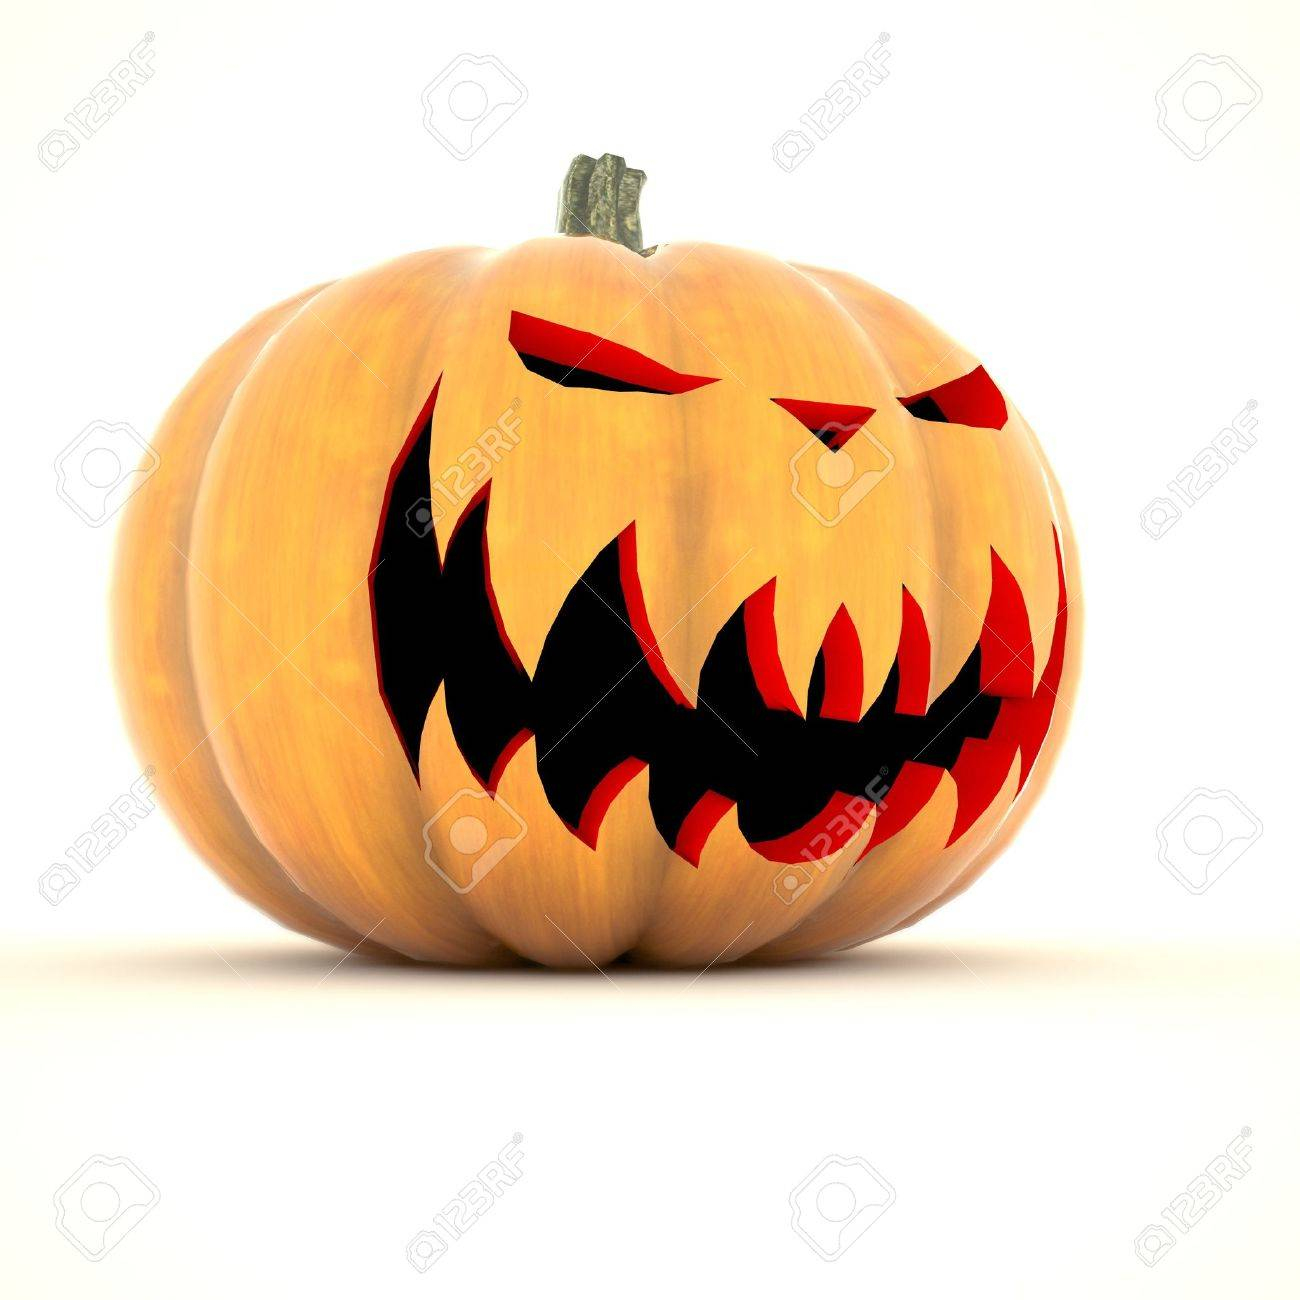 Halloween pumpkin isolated on white background - 15816269